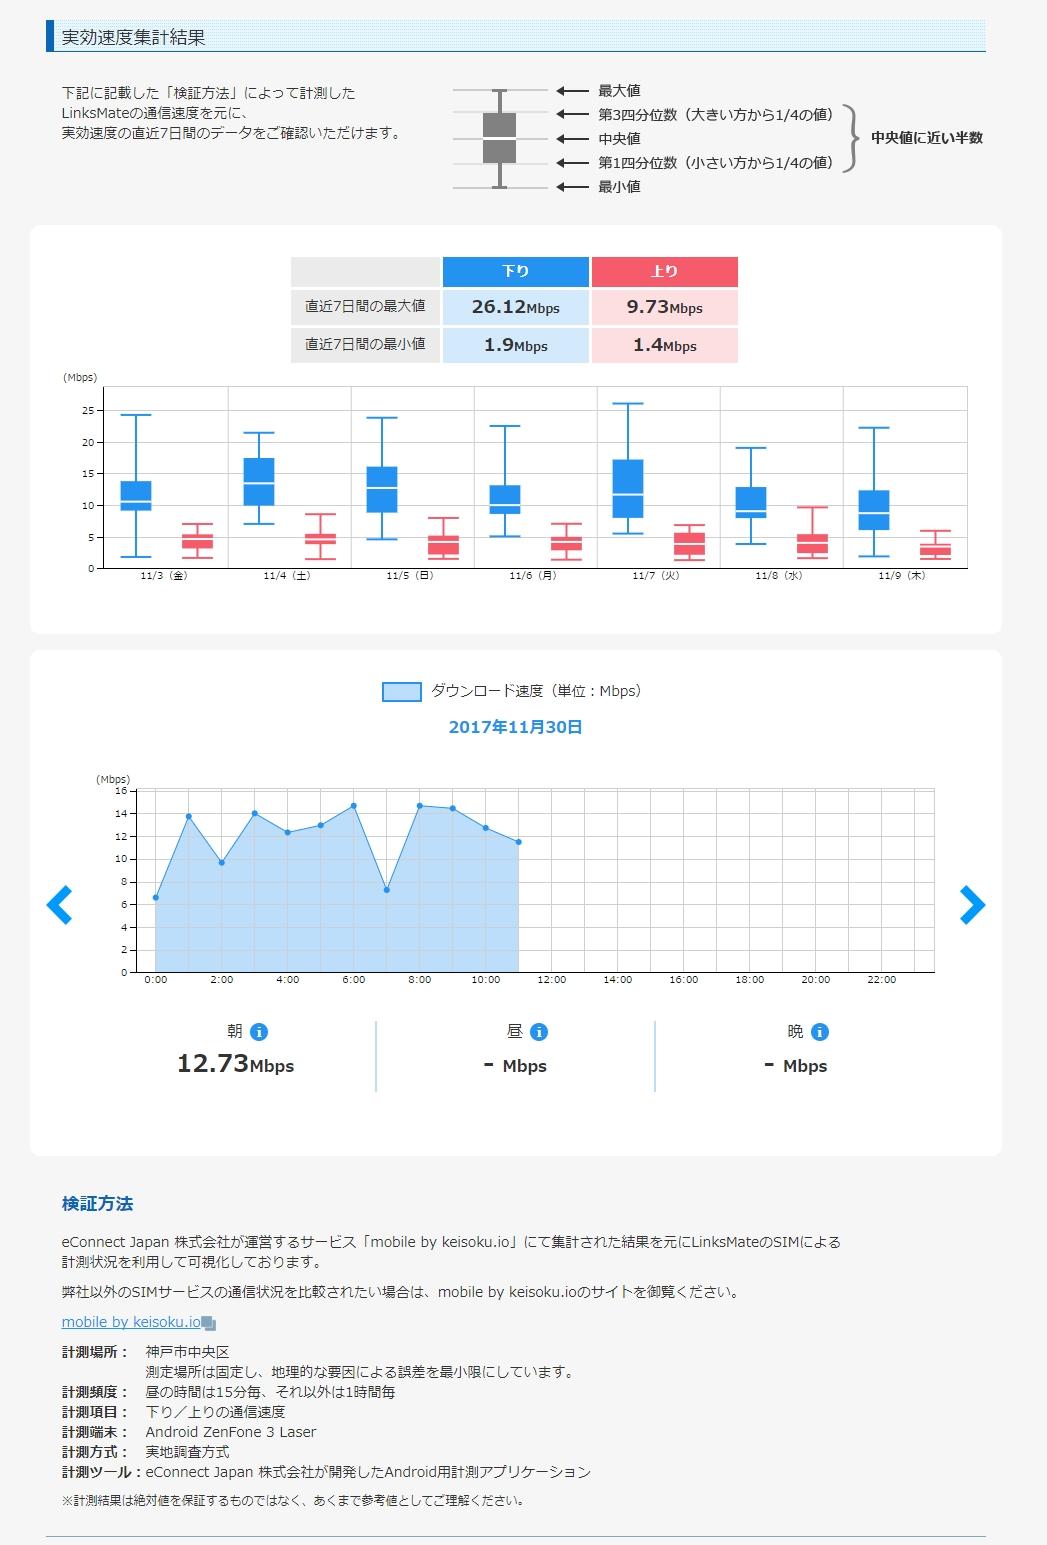 「LinksMate」が通信速度計測サービス「mobile by keisoku.io」とシステム連携